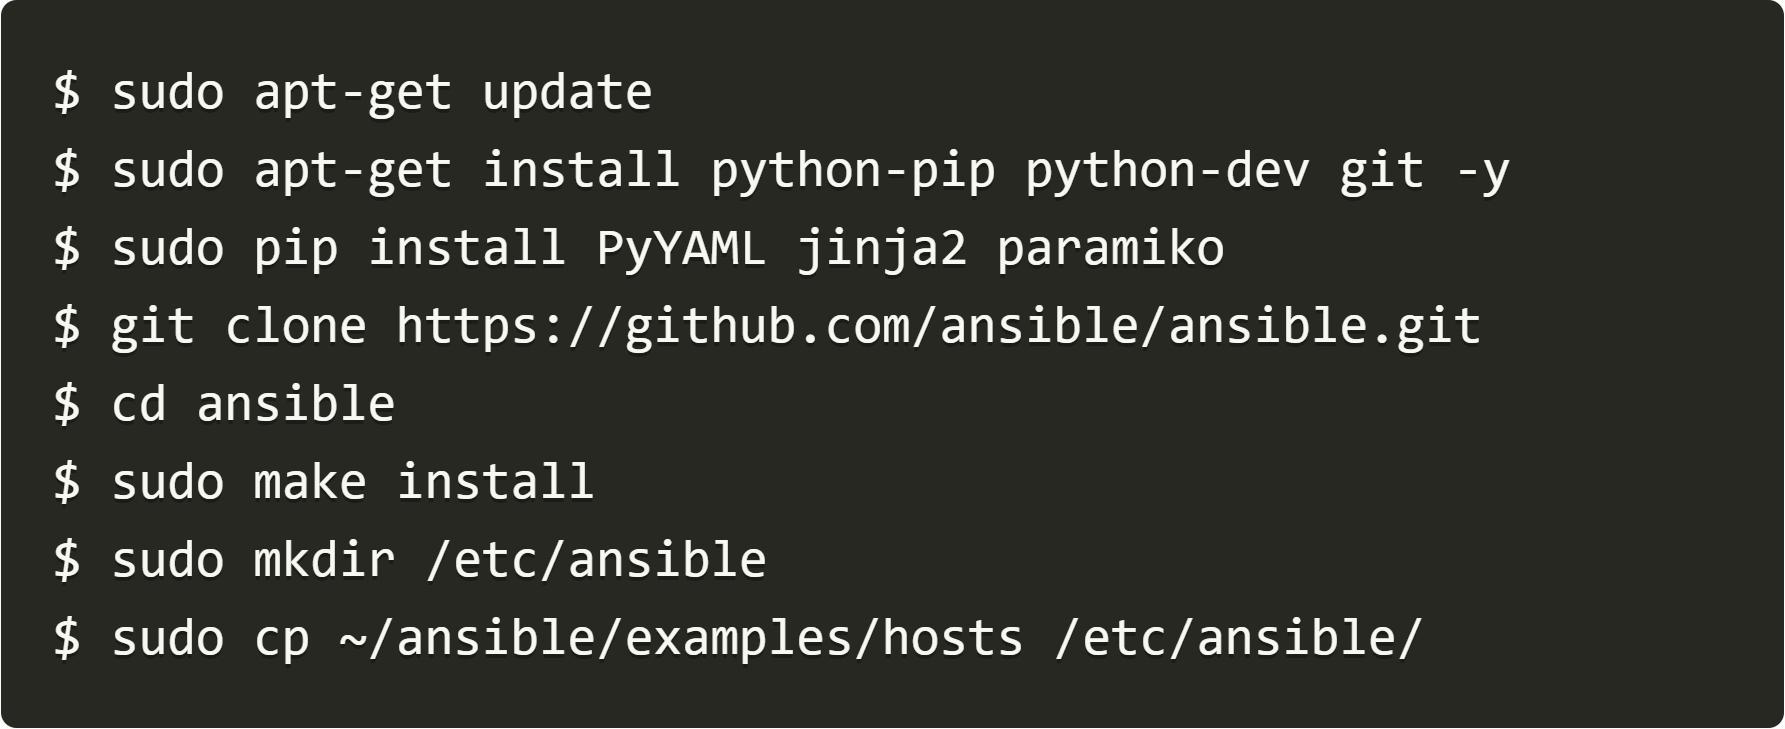 Debian install PyYaml jinja2 paramiko